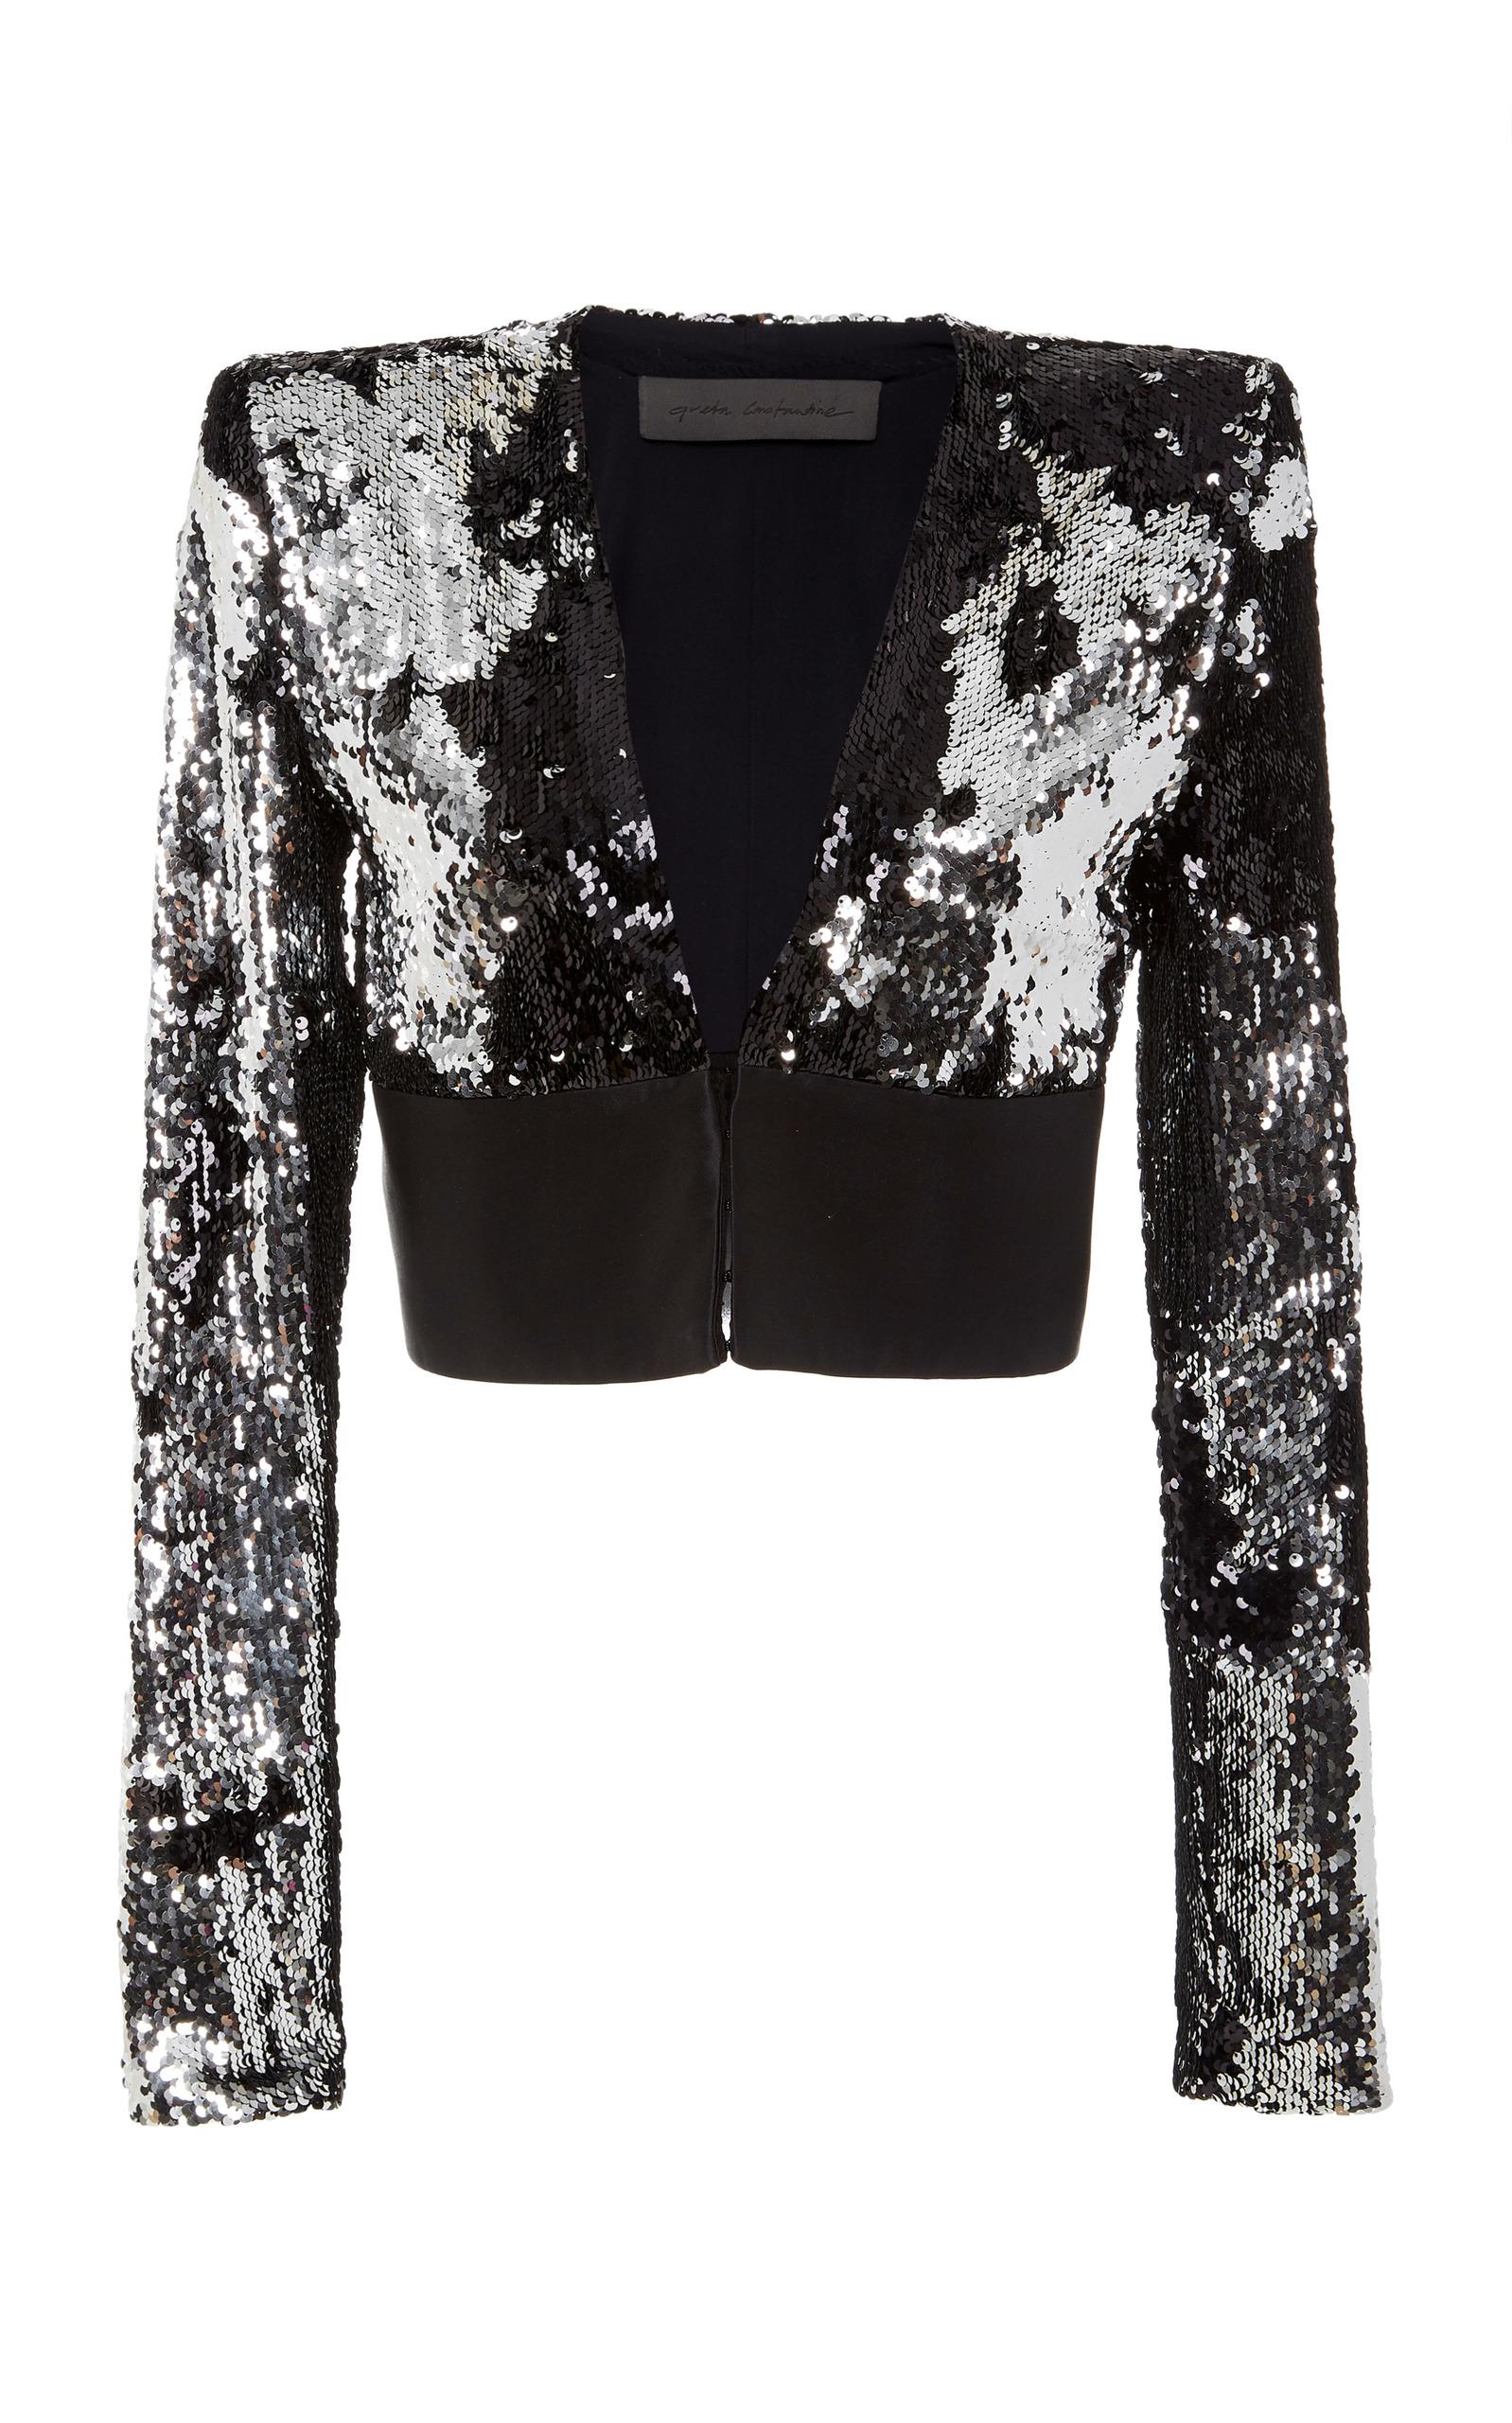 GRETA CONSTANTINE Trixie Bolero Embellished Jacket in Multi